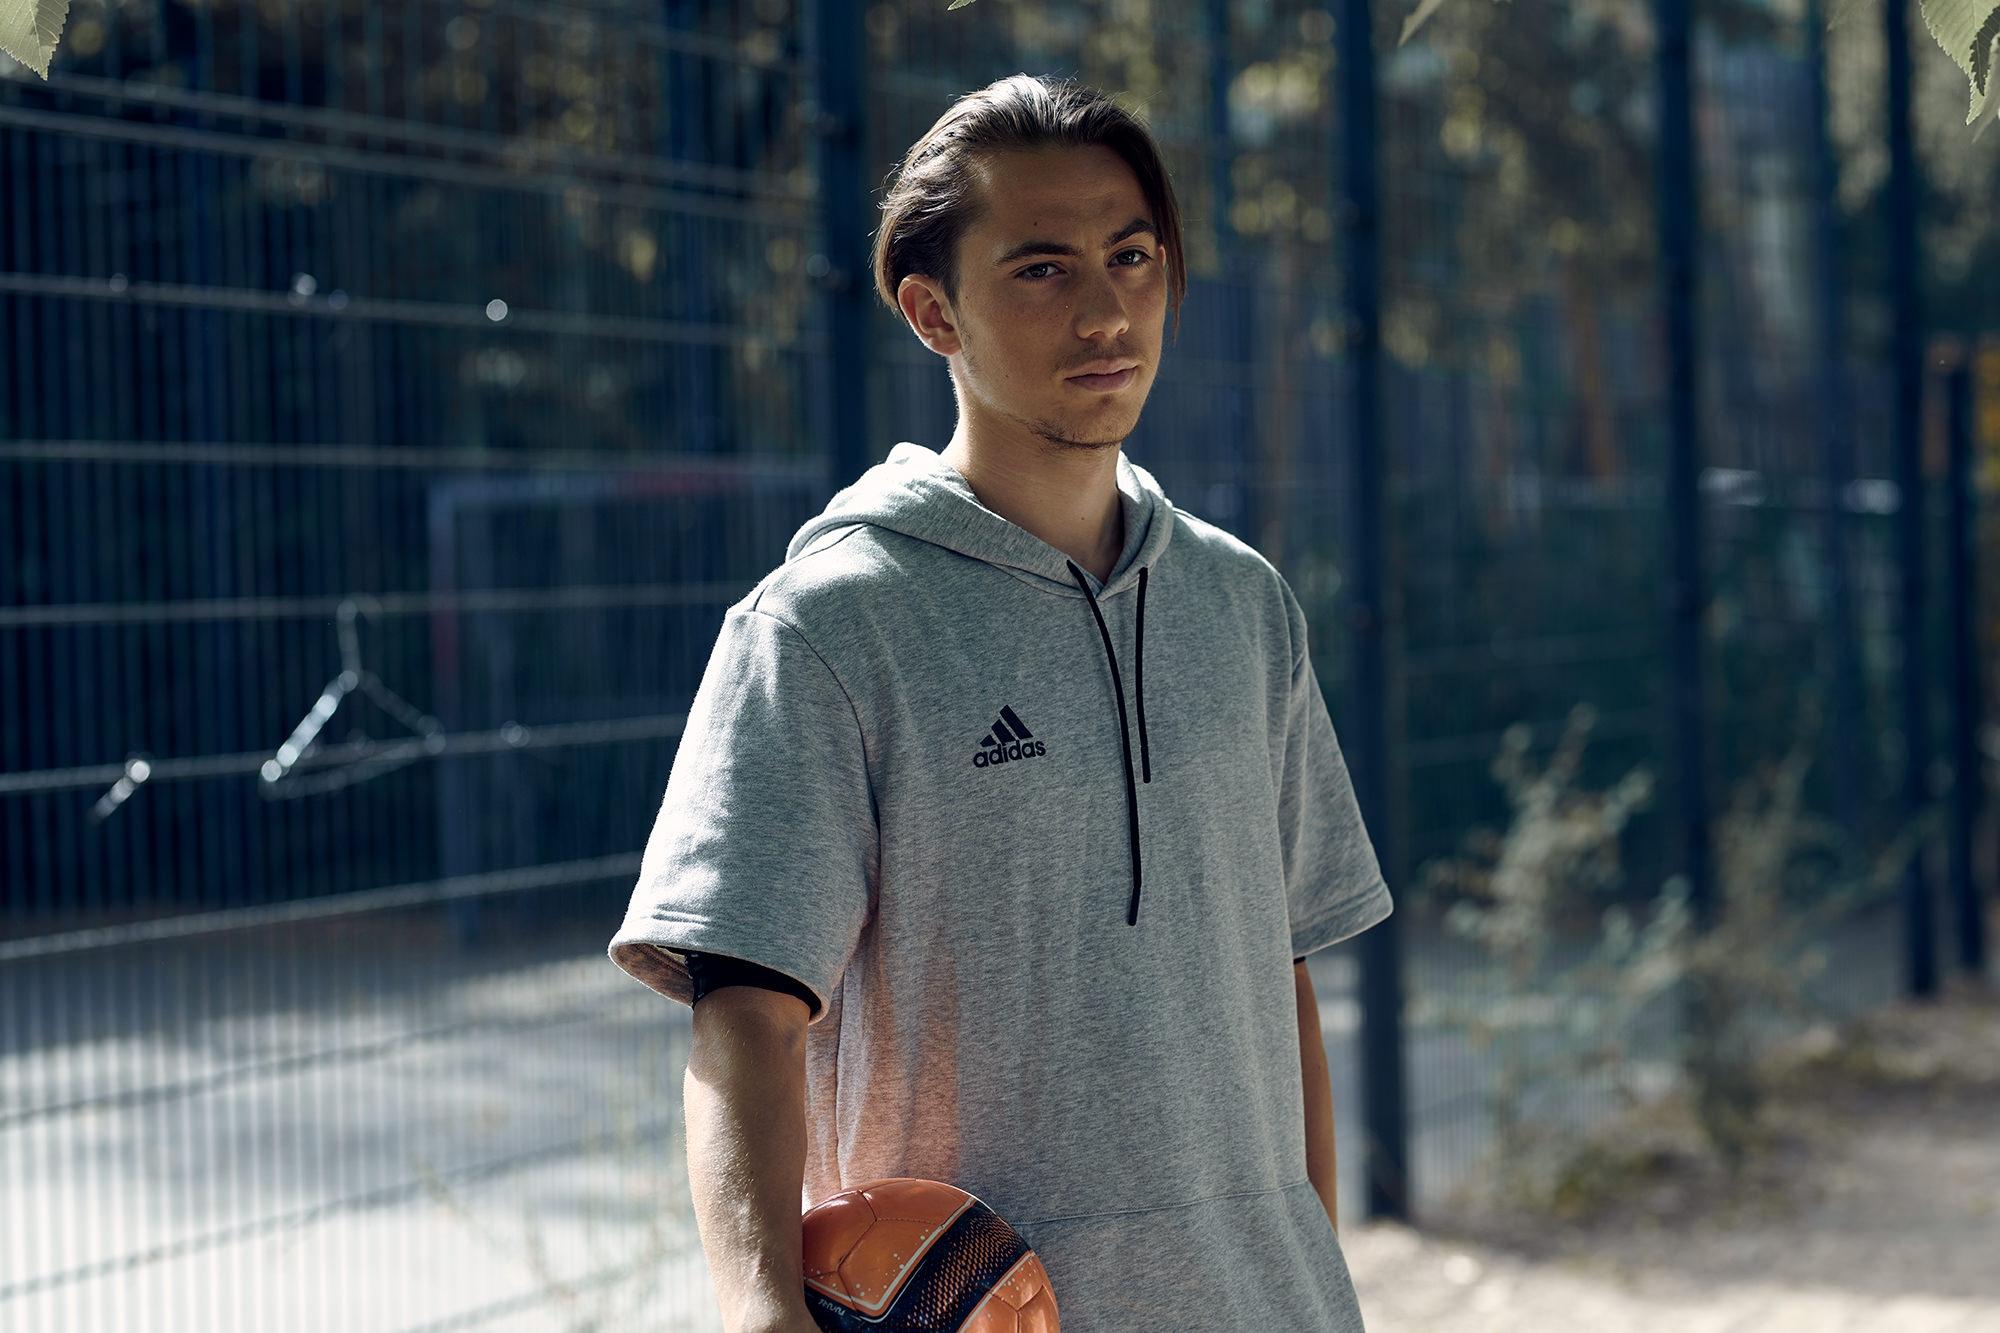 sonjamueller_lifestyle-sport_soccer_0869